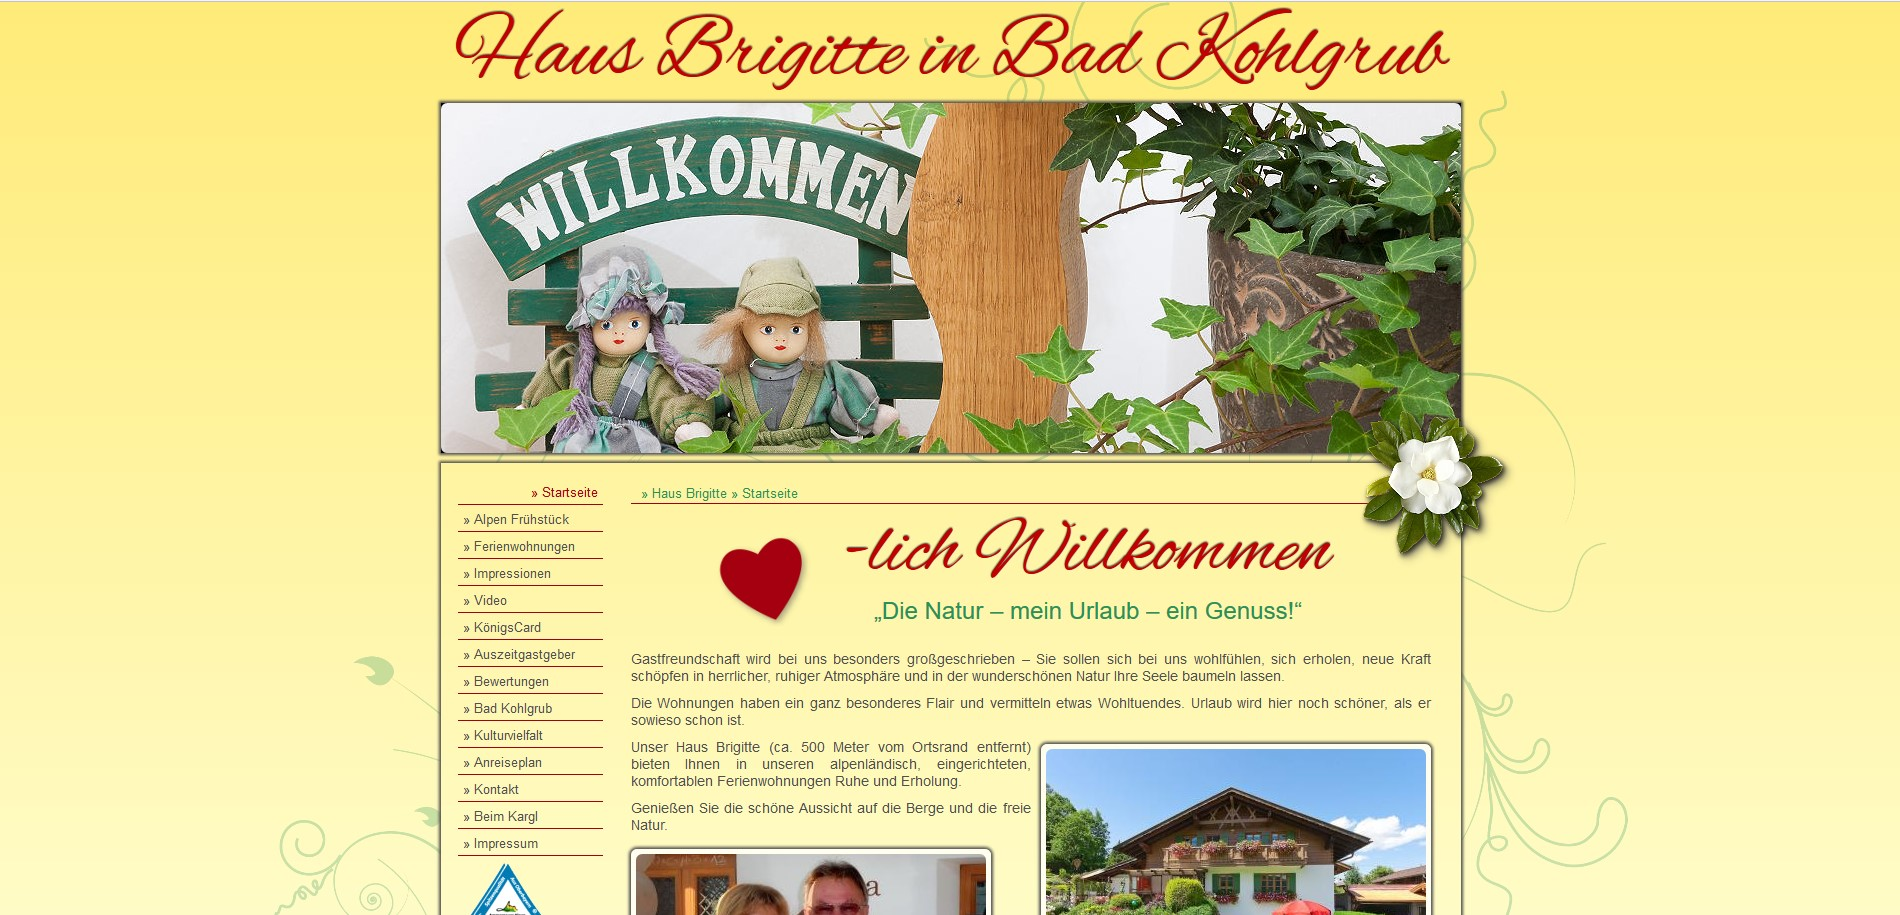 Ferienwohnung Haus Brigitte, Bad Kohlgrub